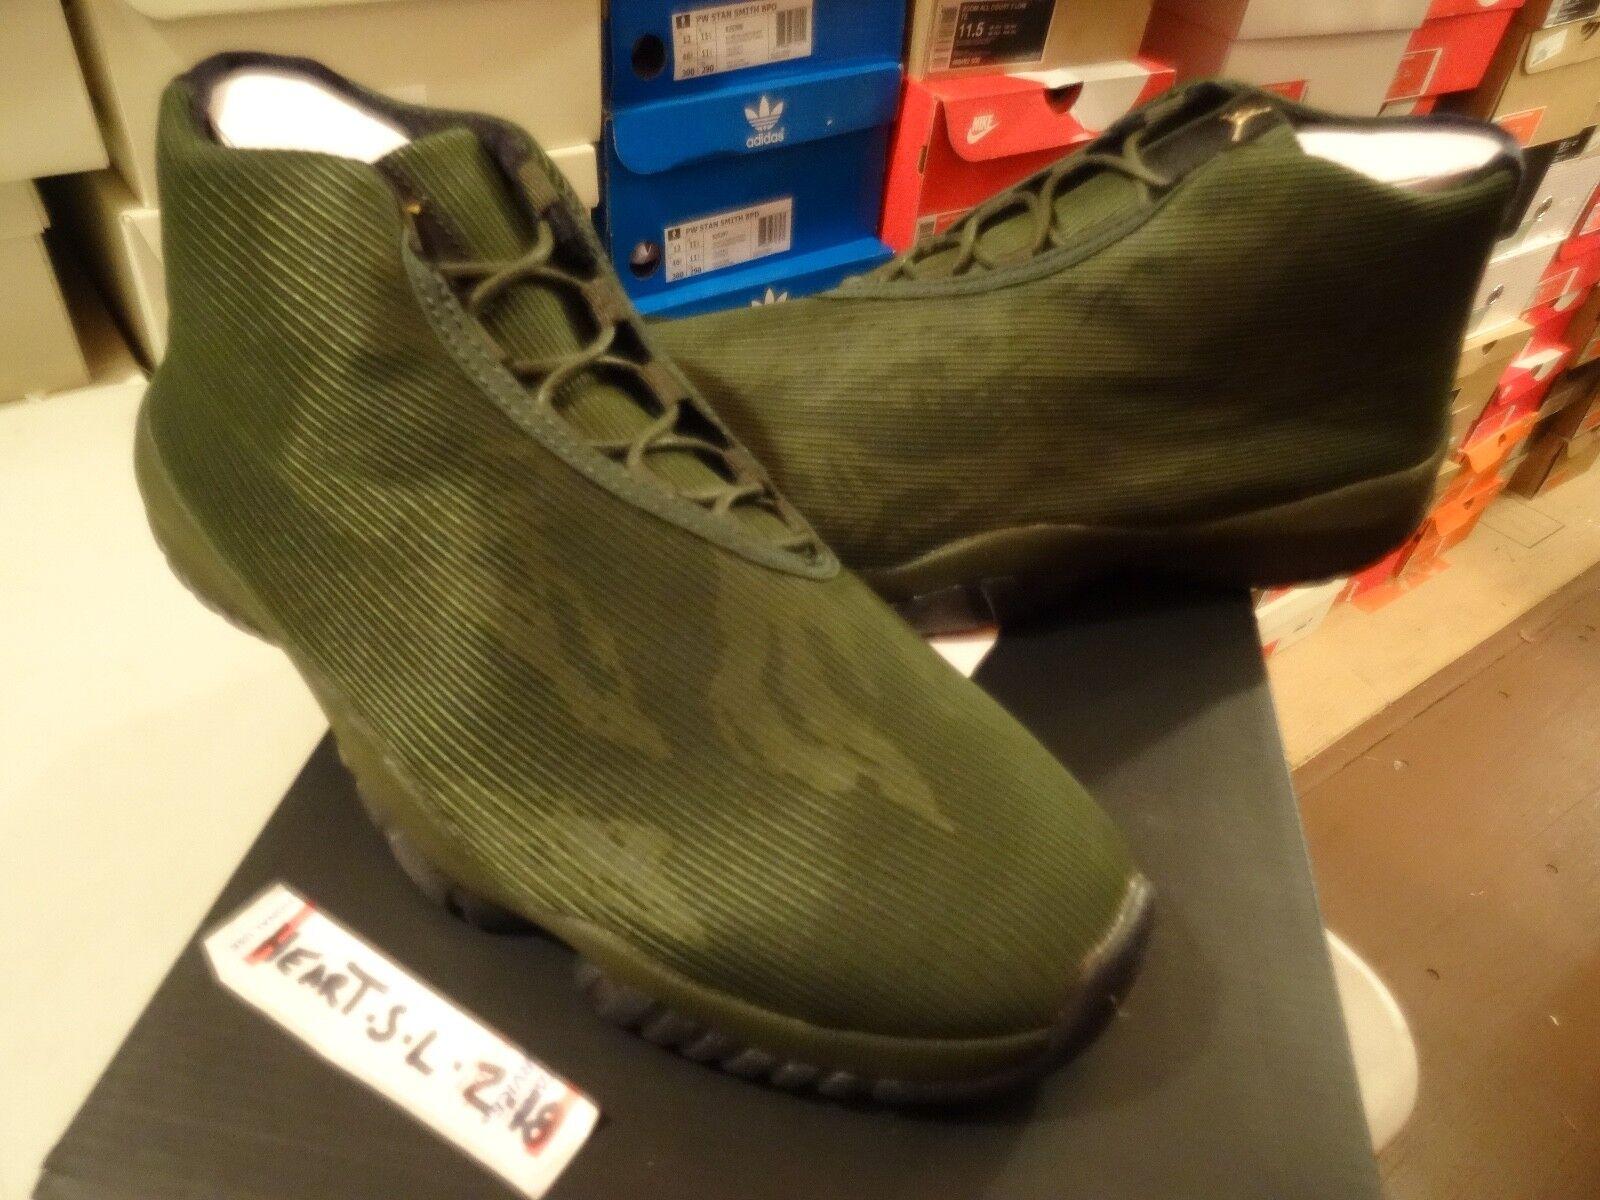 NEW DS Nike Air Jordan Future Sequoia Black-Sequoia Green Camo 656503-301 SZ 12